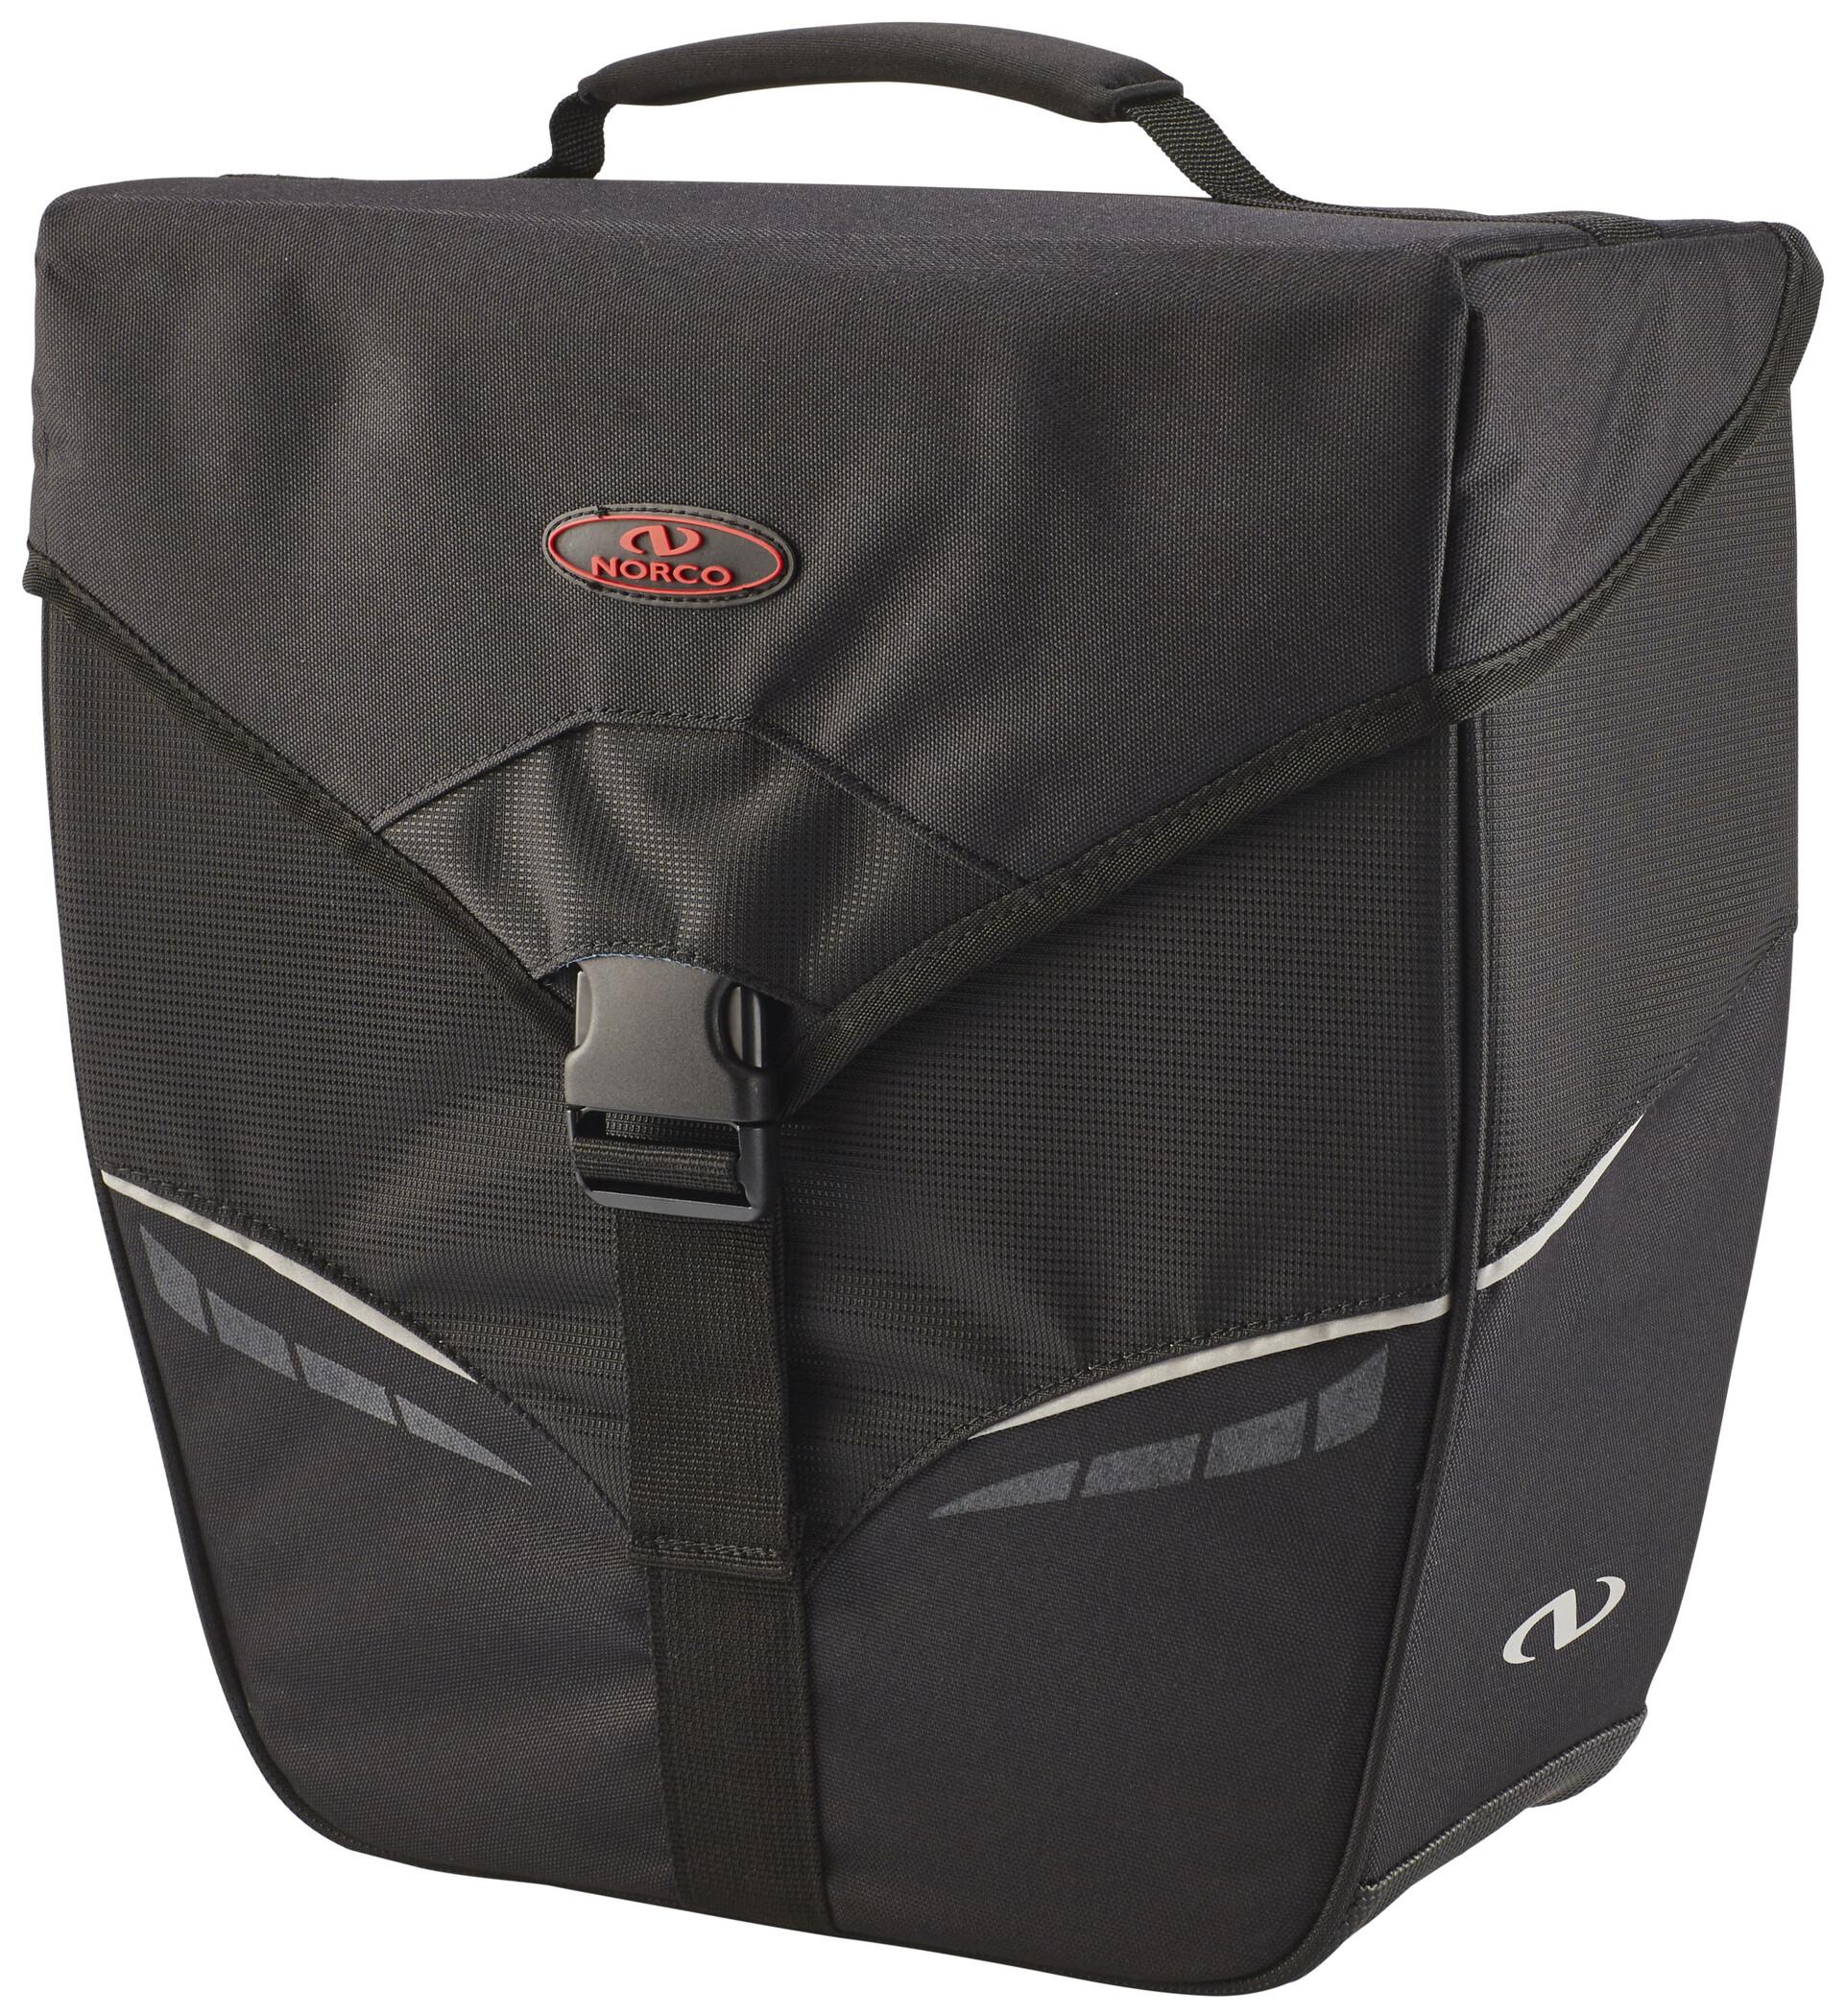 Norco Orlando City Cykeltaske, black (2019) | Rack bags